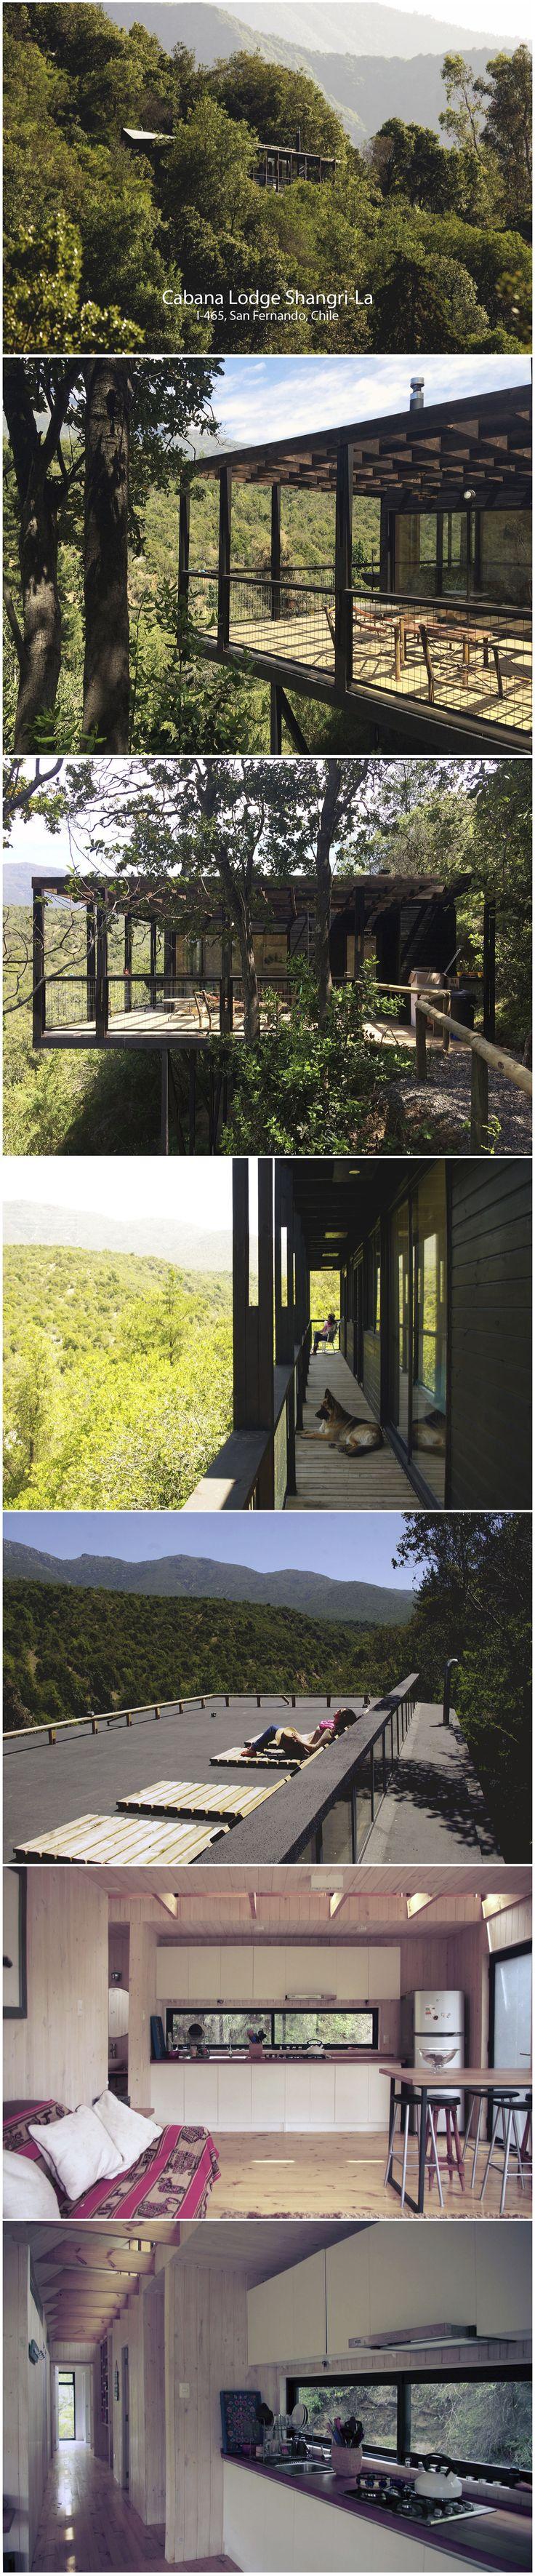 Cabana Lodge Shangri-La I-465, San Fernando, Chile